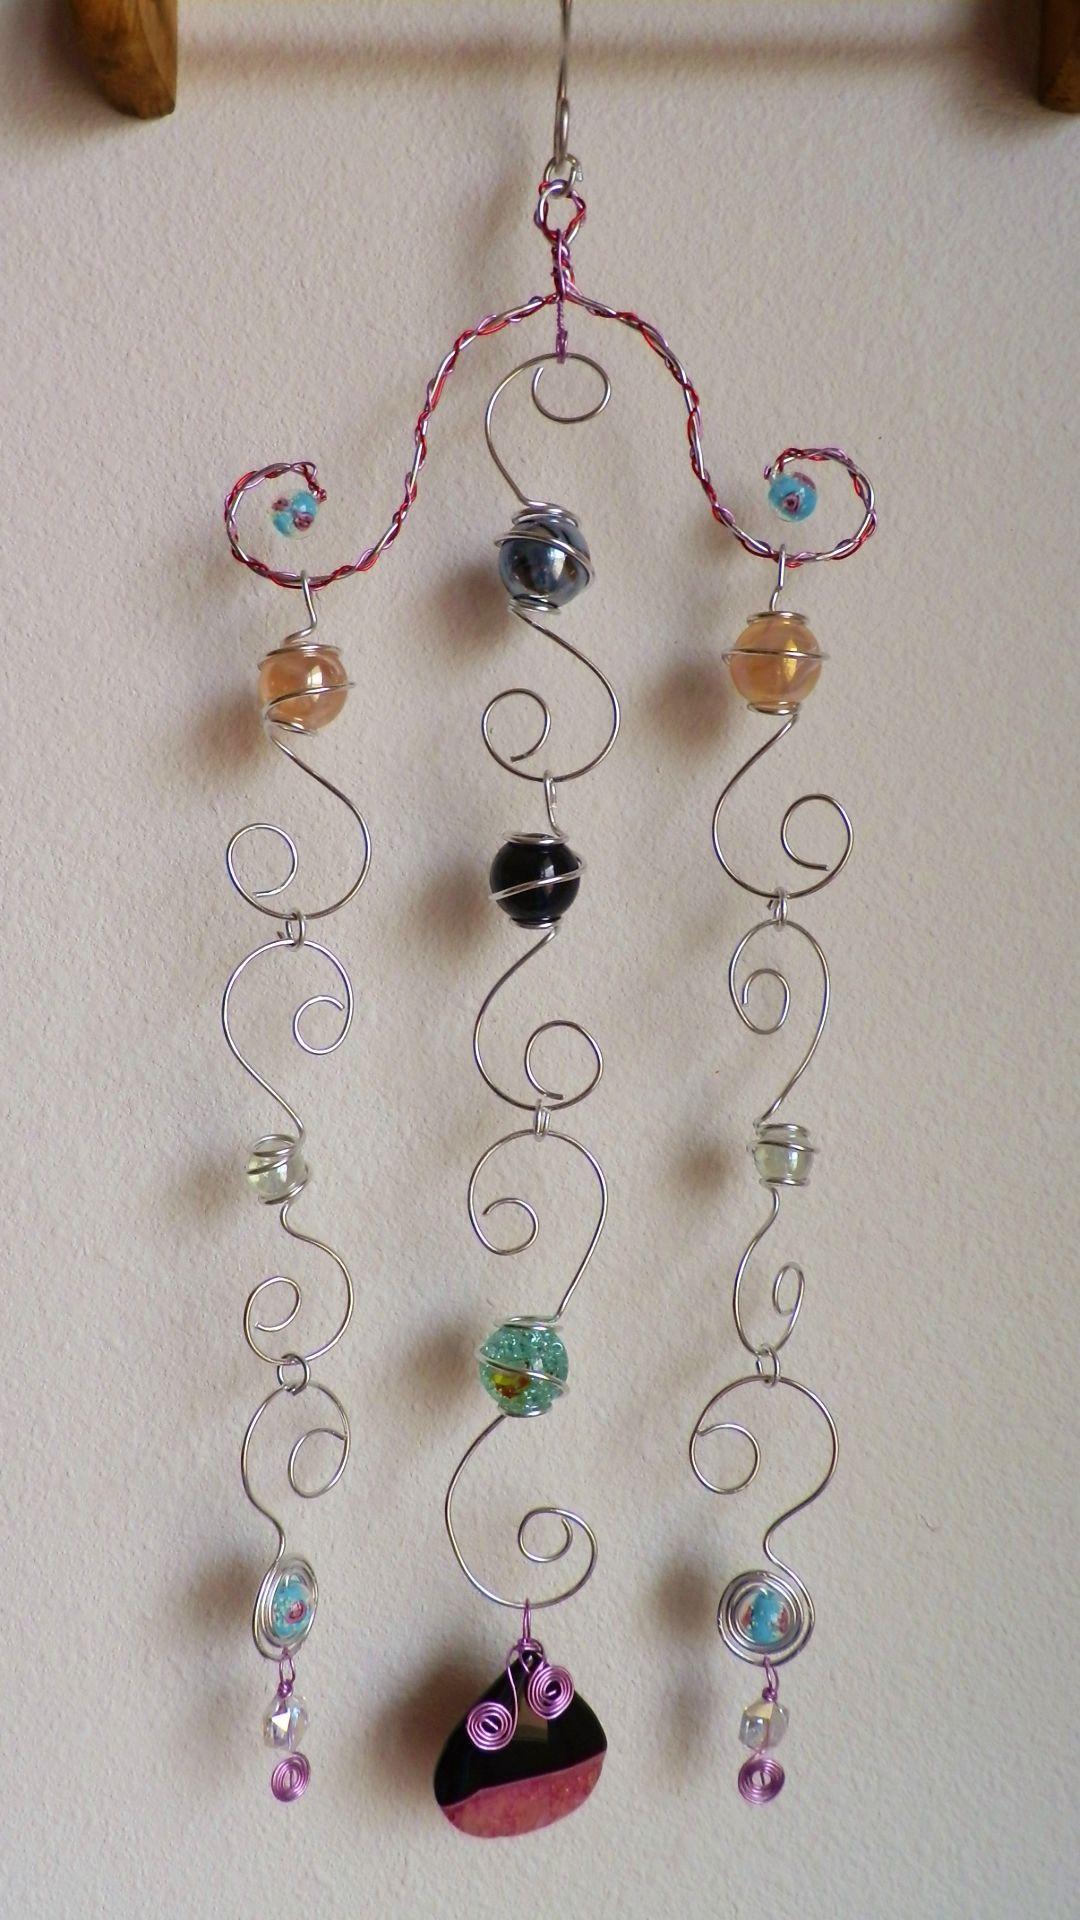 Wire Wrapped Marble Suncatcher Sun Catcher Wind Chimewindow Charm Hazel Glass Eye Silver Wrap Pendant By Kimsjewels On Etsy I Made Work Beads